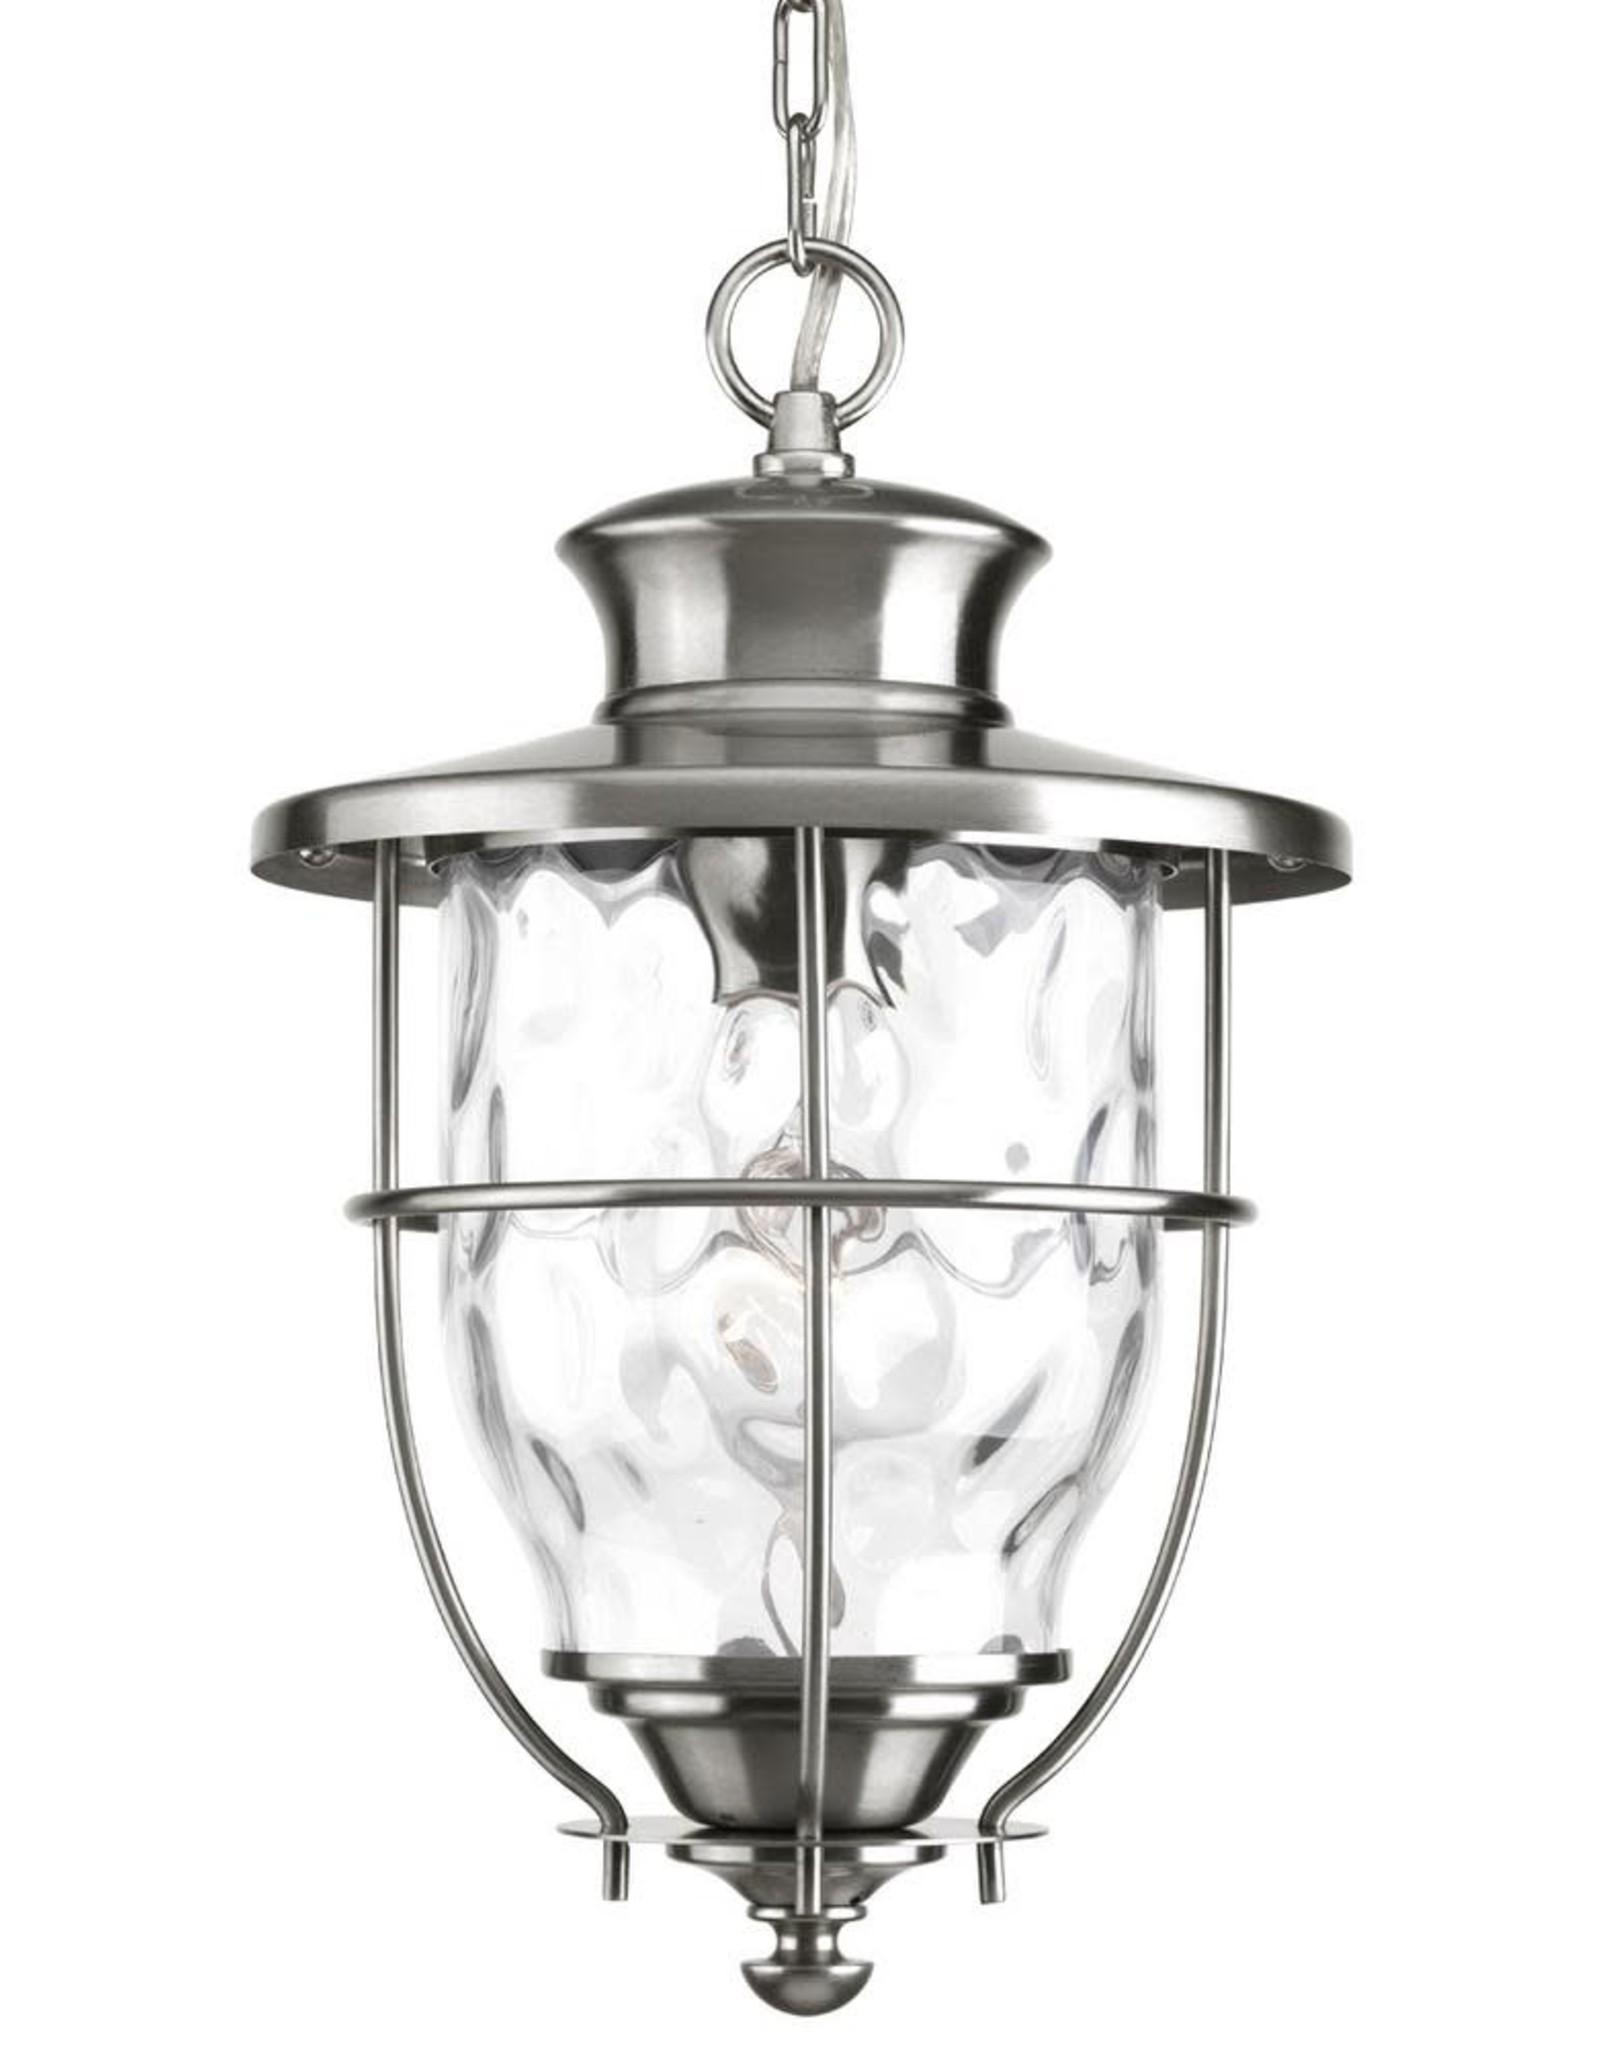 Progress Lighting Beacon Collection Stainless Steel Outdoor Hanging Lantern